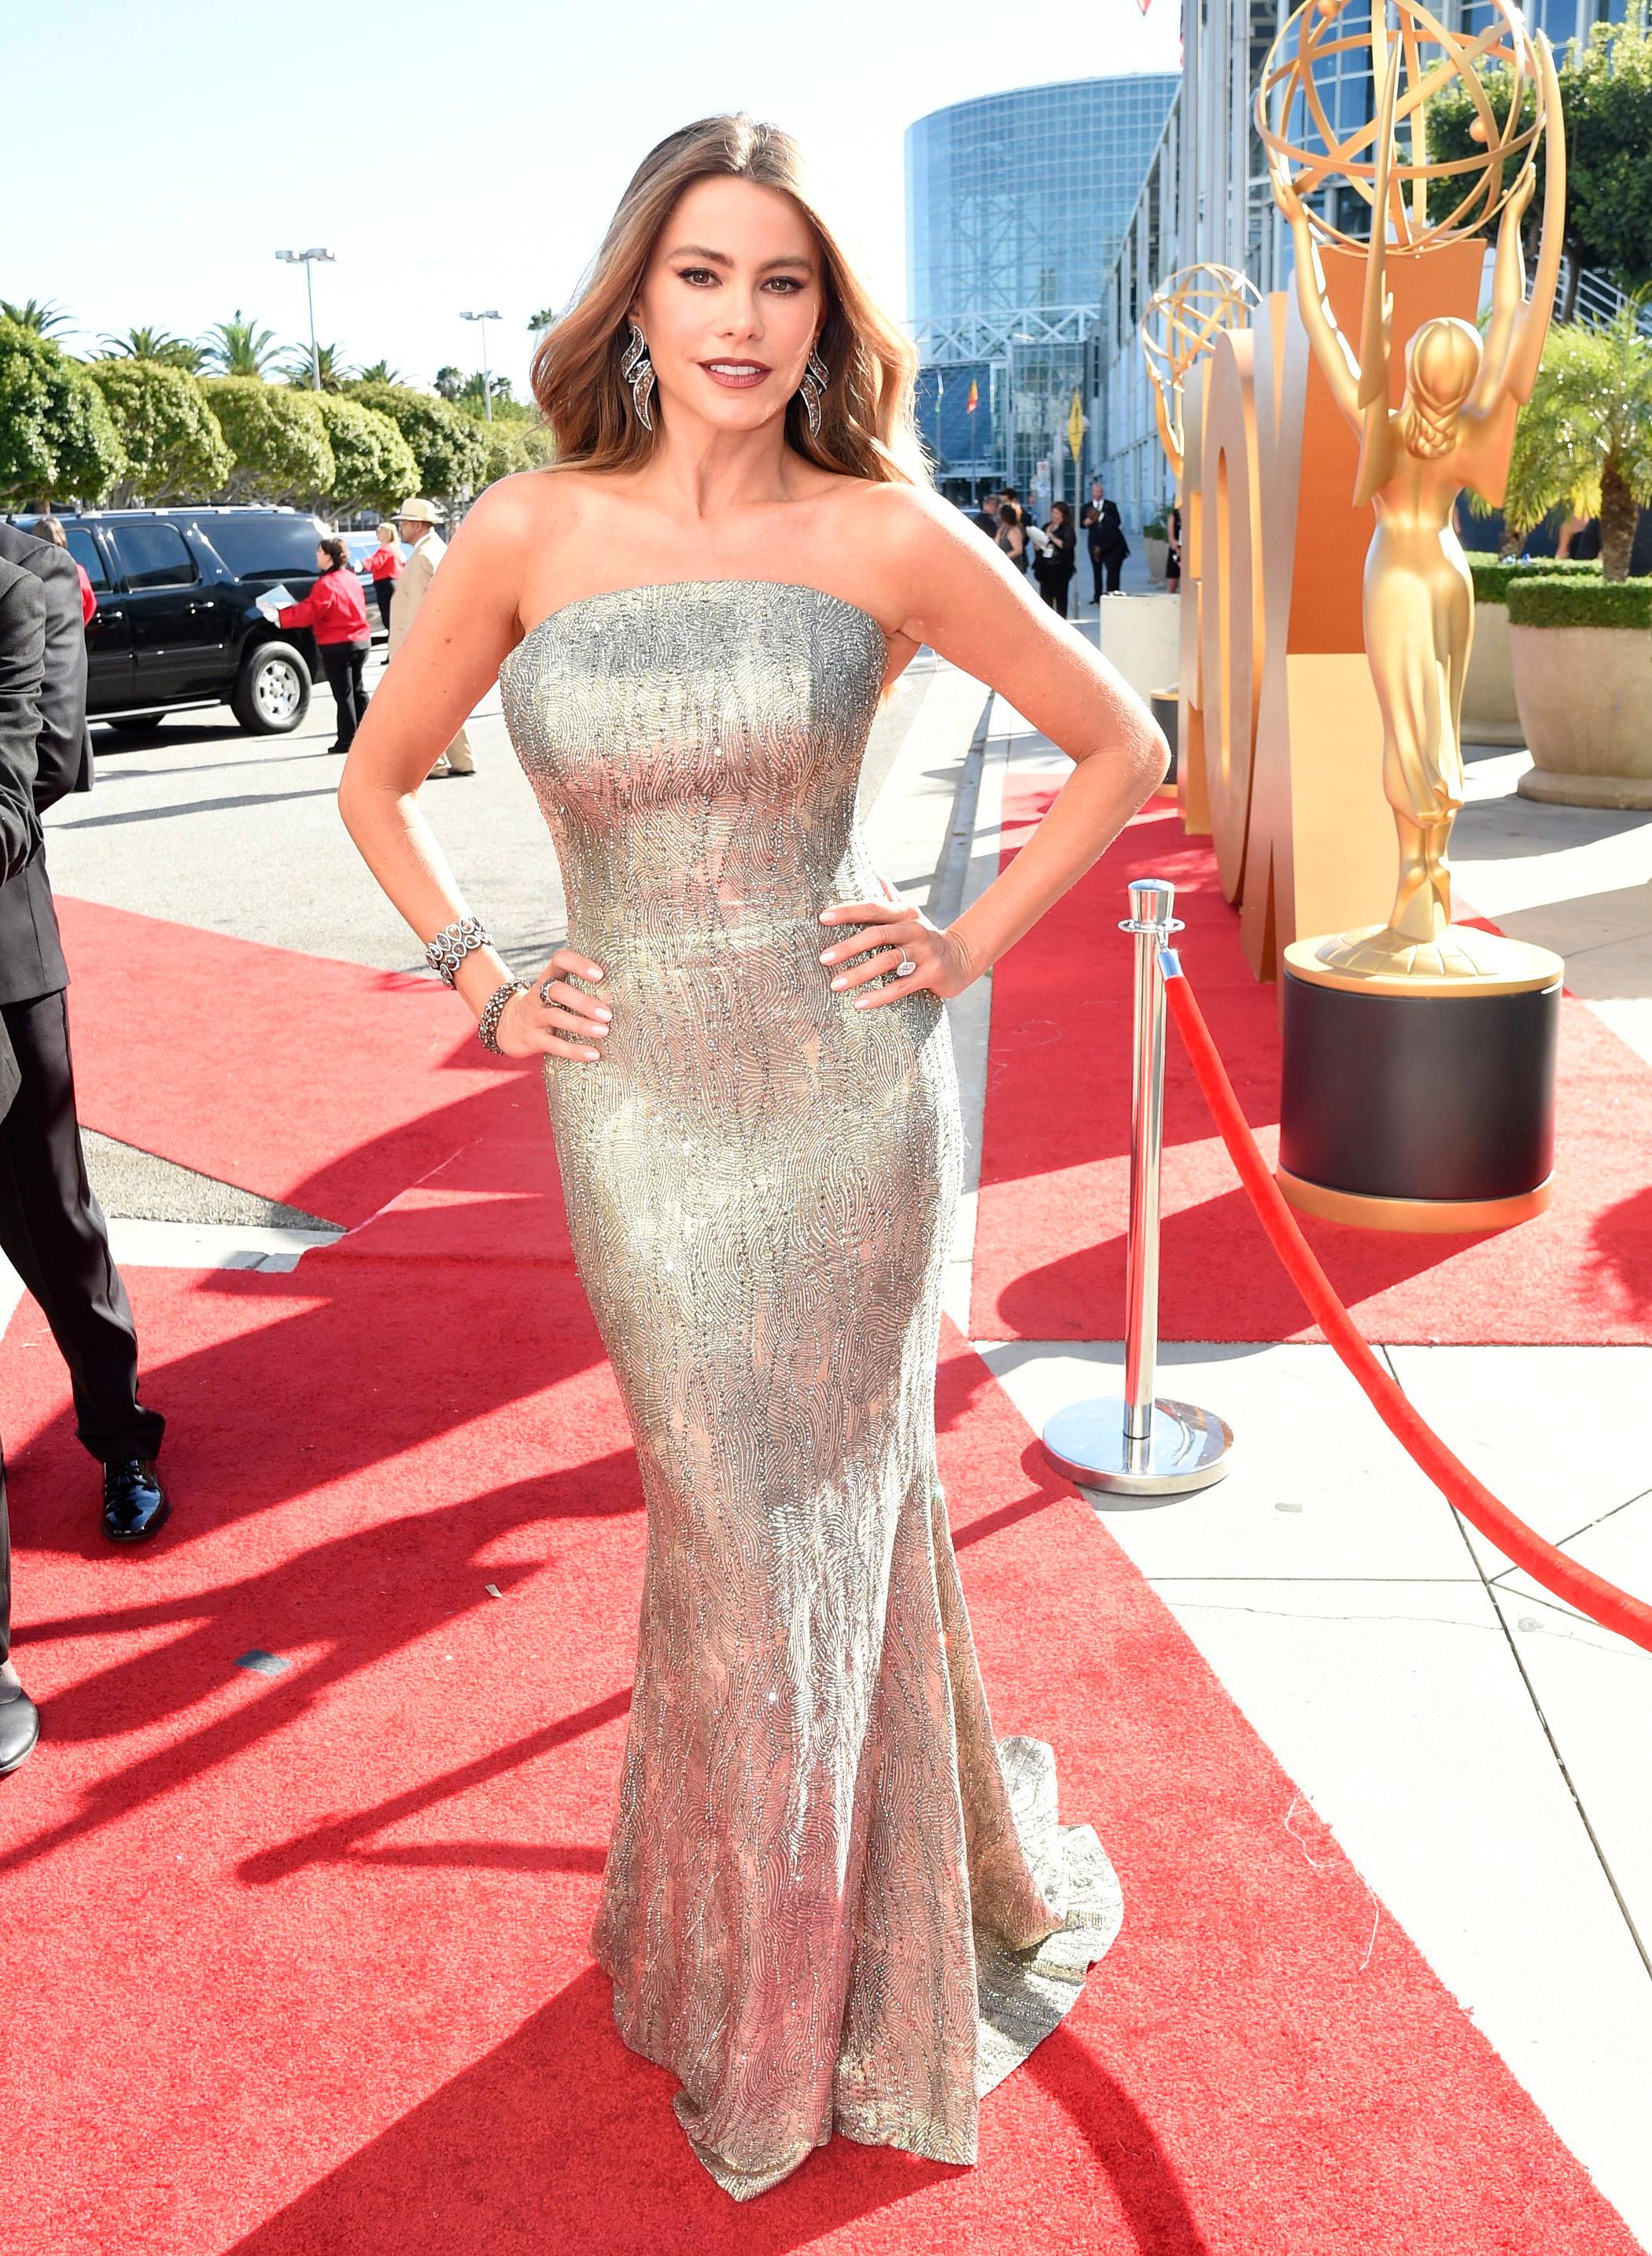 SofÌa Vergara at the 67th Emmy Award on Sept. 20, 2015 in Los Angeles.